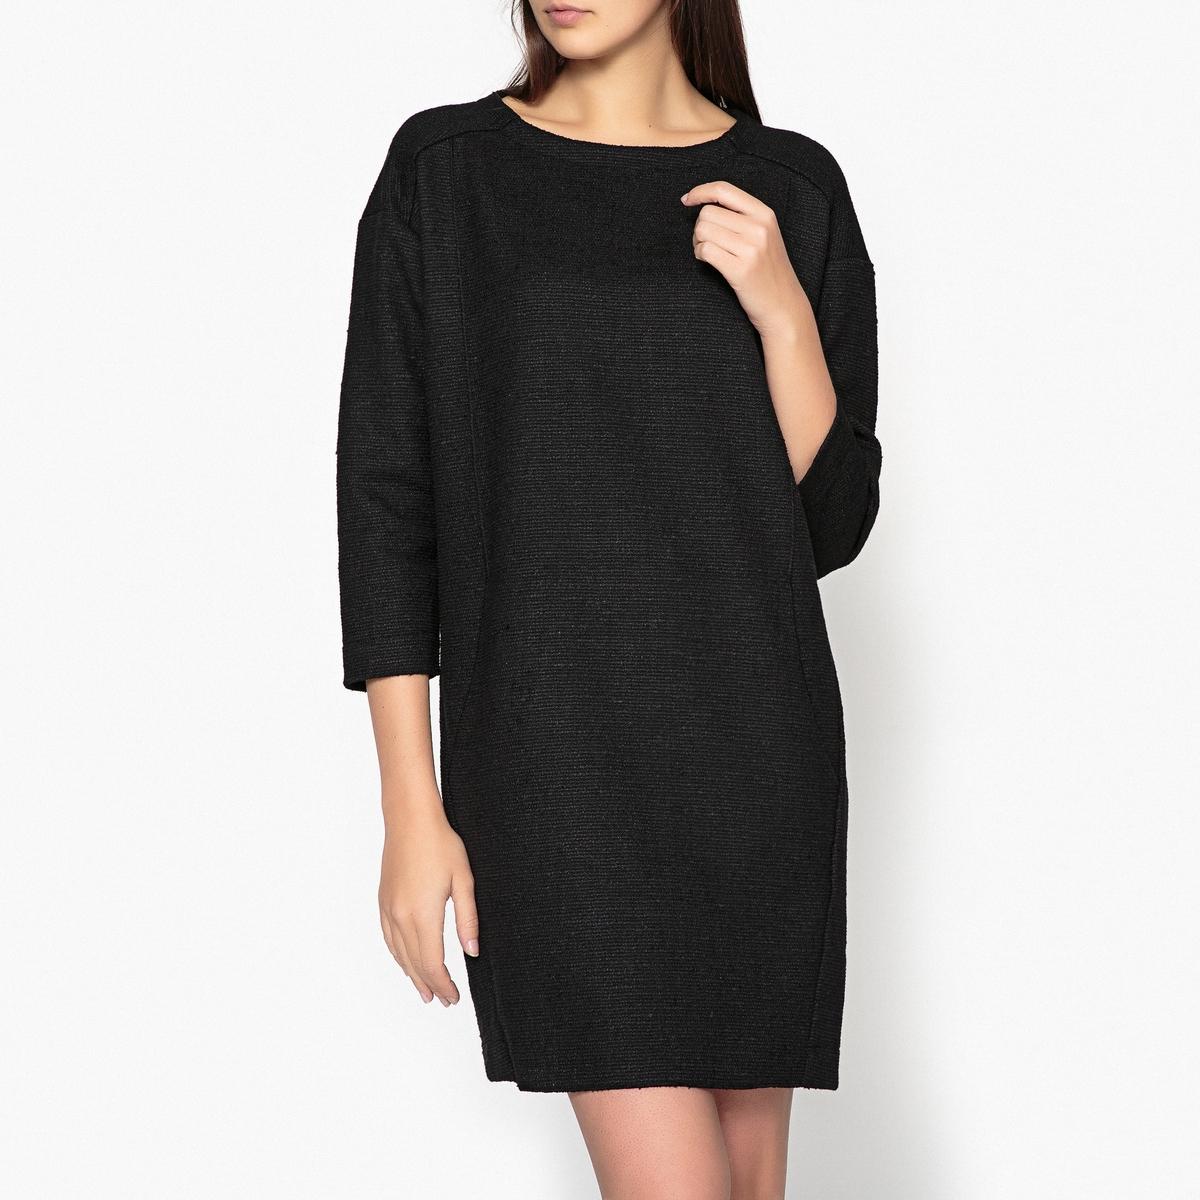 Платье-футляр LaRedoute La Redoute 38 (FR) - 44 (RUS) черный платье laredoute из кружева oilway 40 fr 46 rus черный